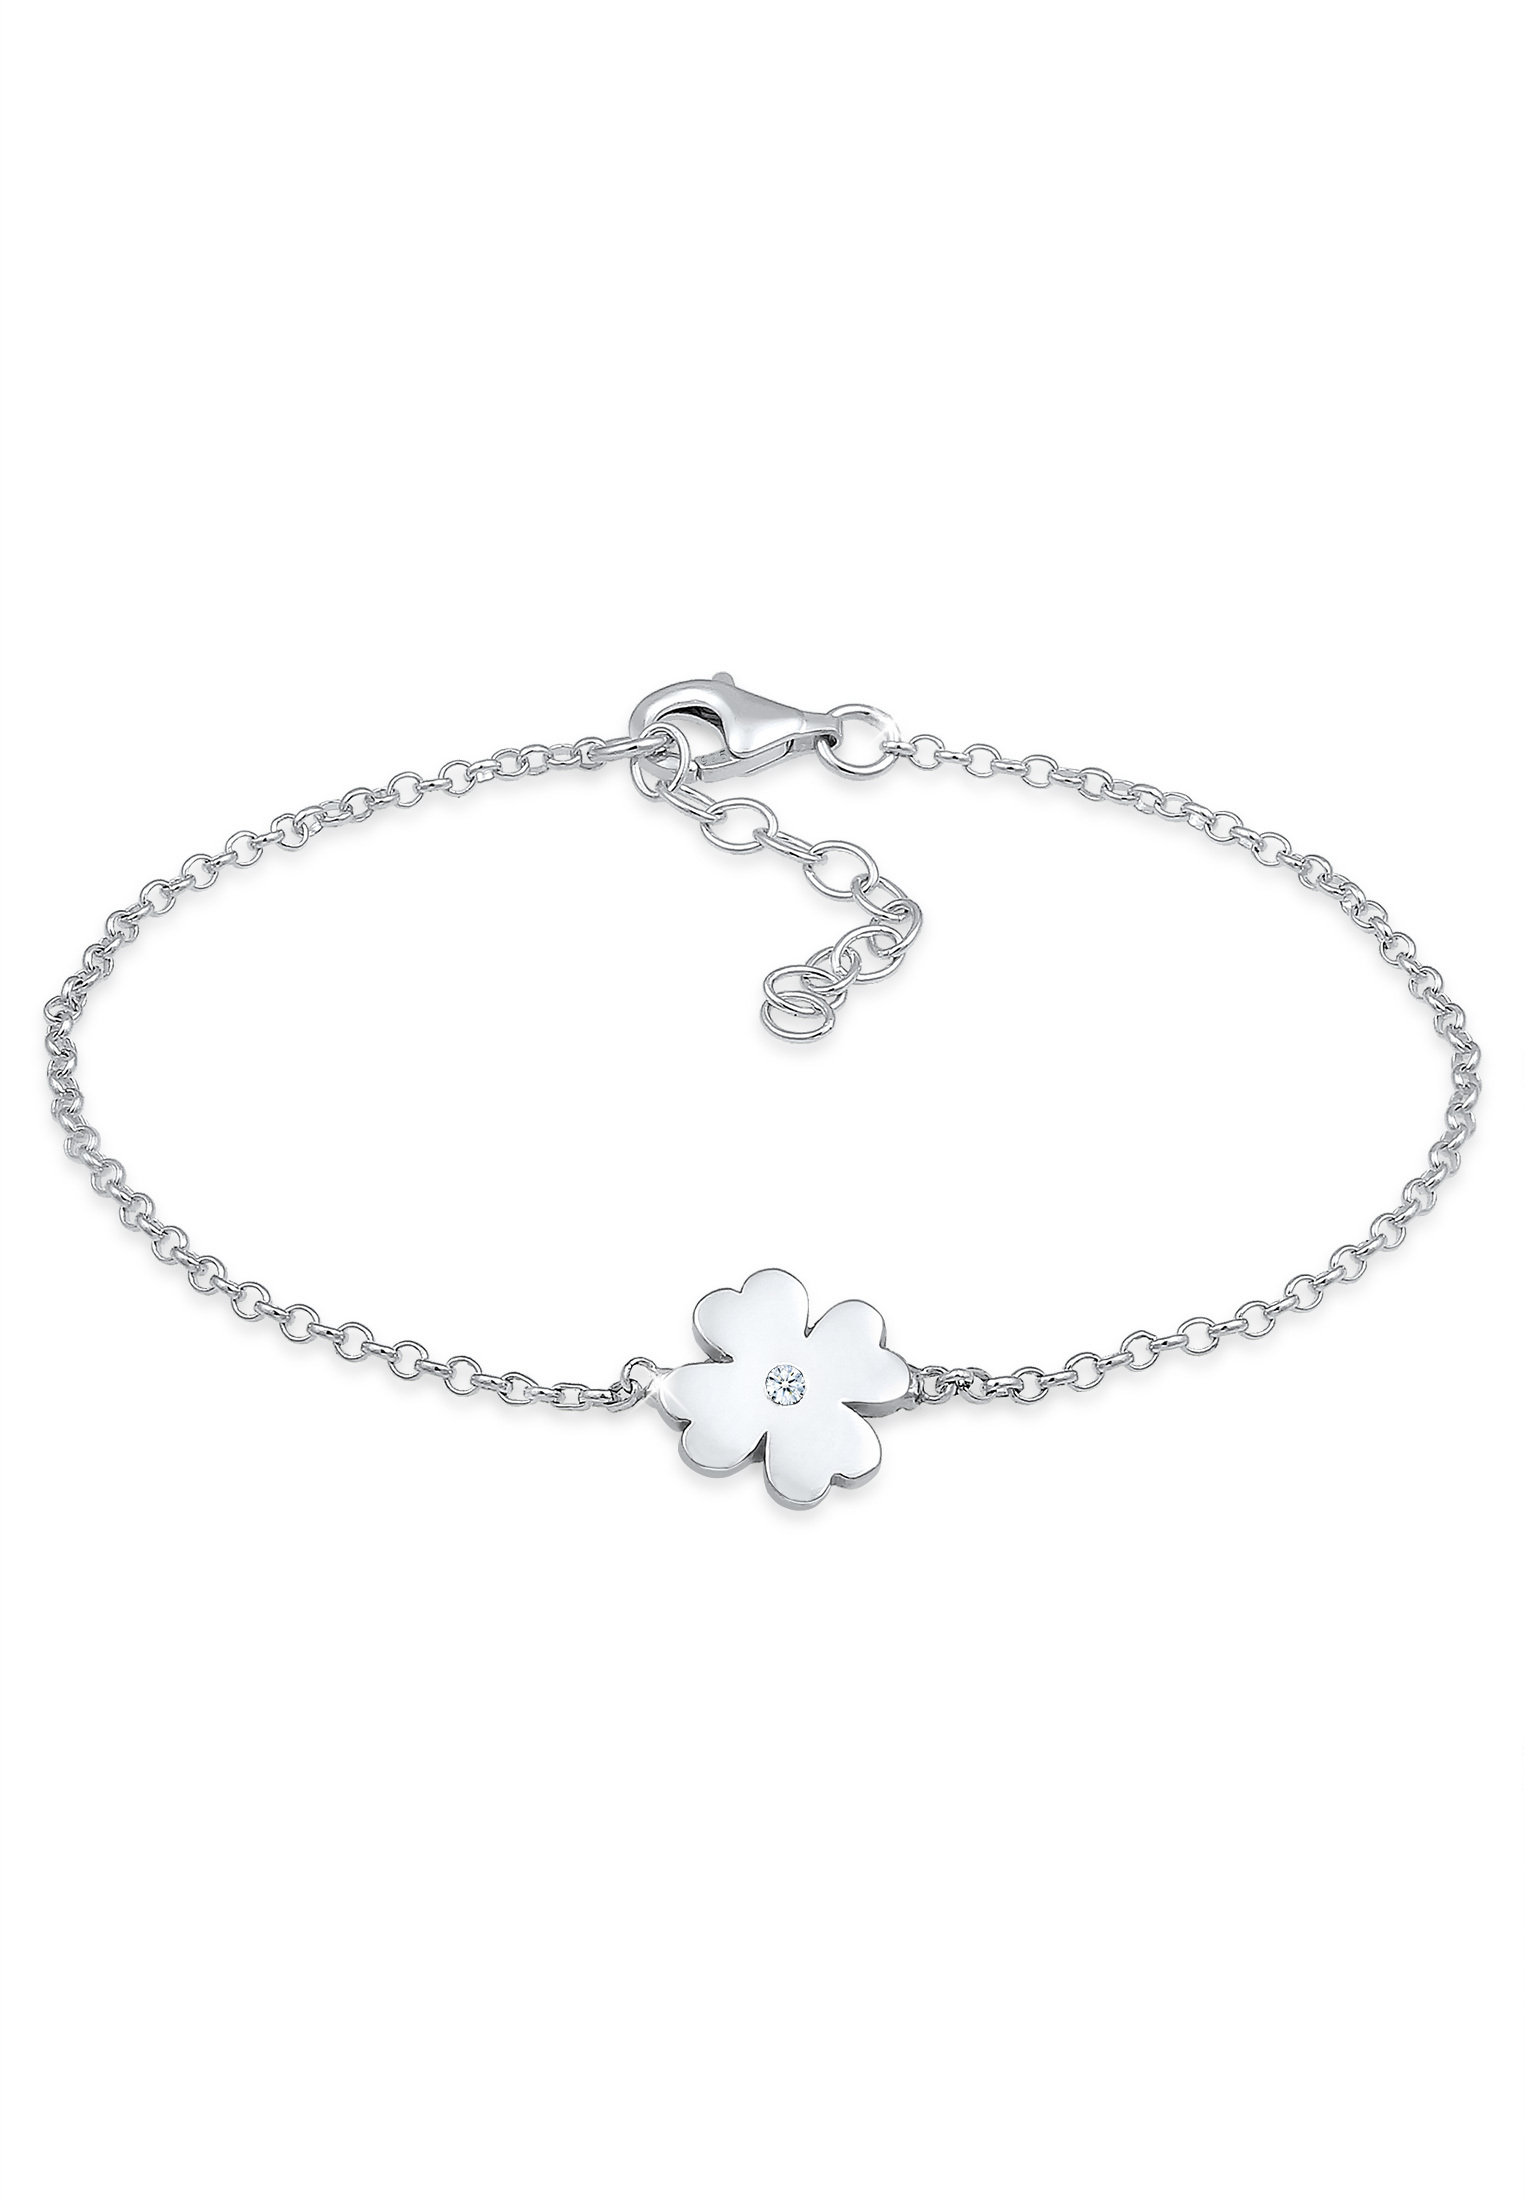 Armband Kleeblatt | Diamant ( Weiß, 0,015 ct ) | 925er Sterling Silber